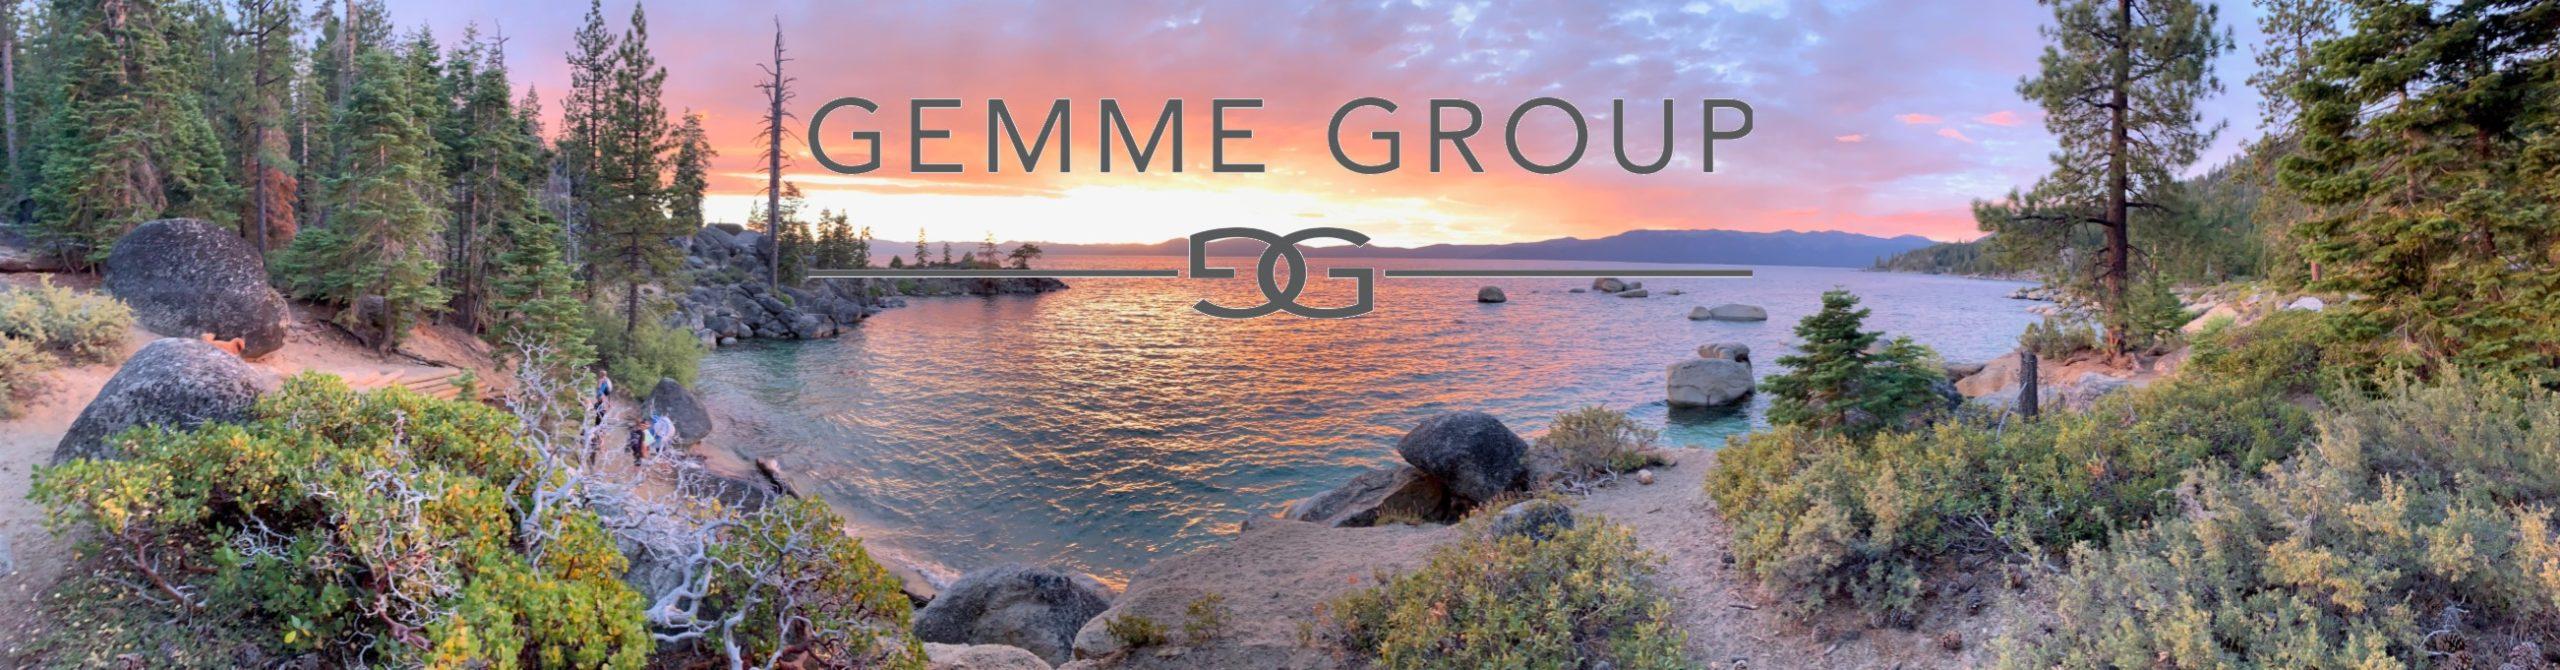 Gemme Group Lake Tahoe